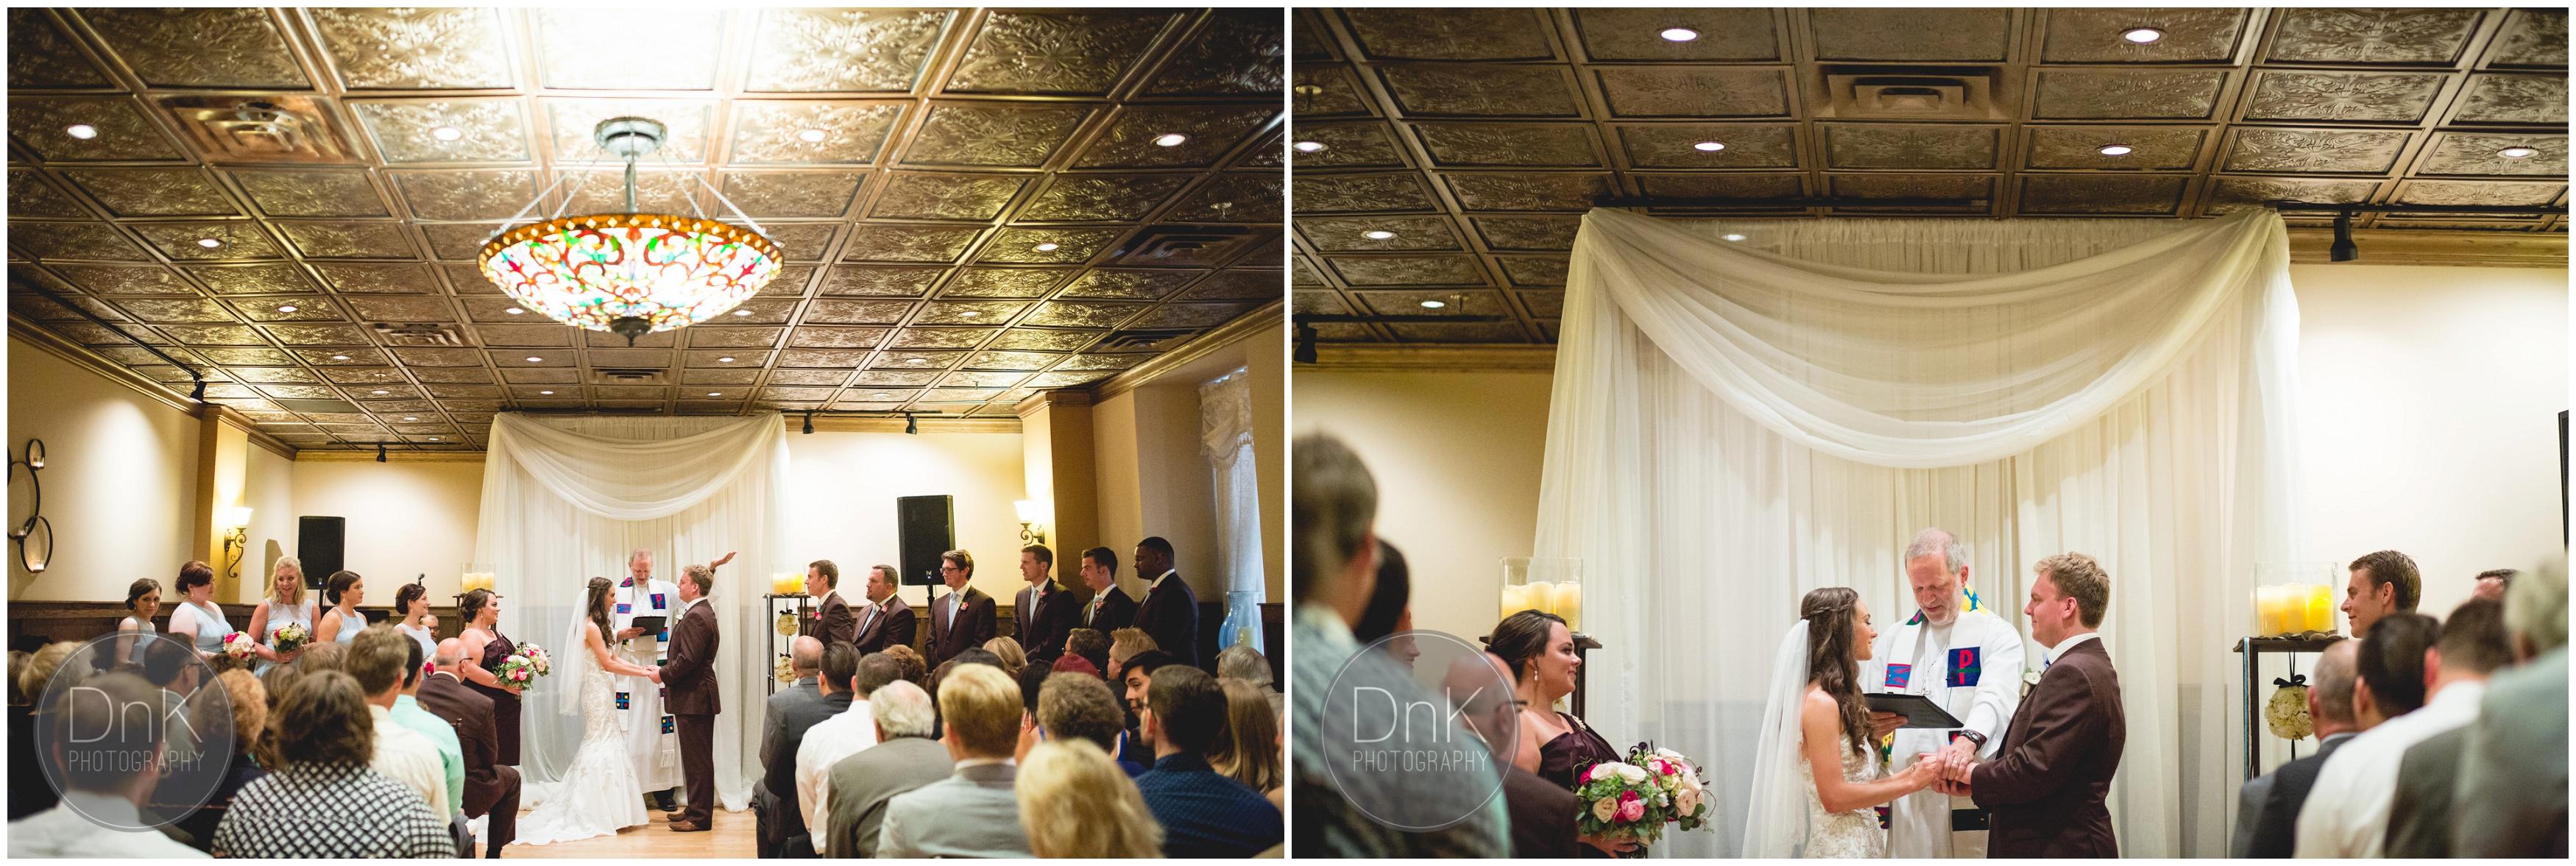 20 - 413 on Wacouta Wedding Ceremony